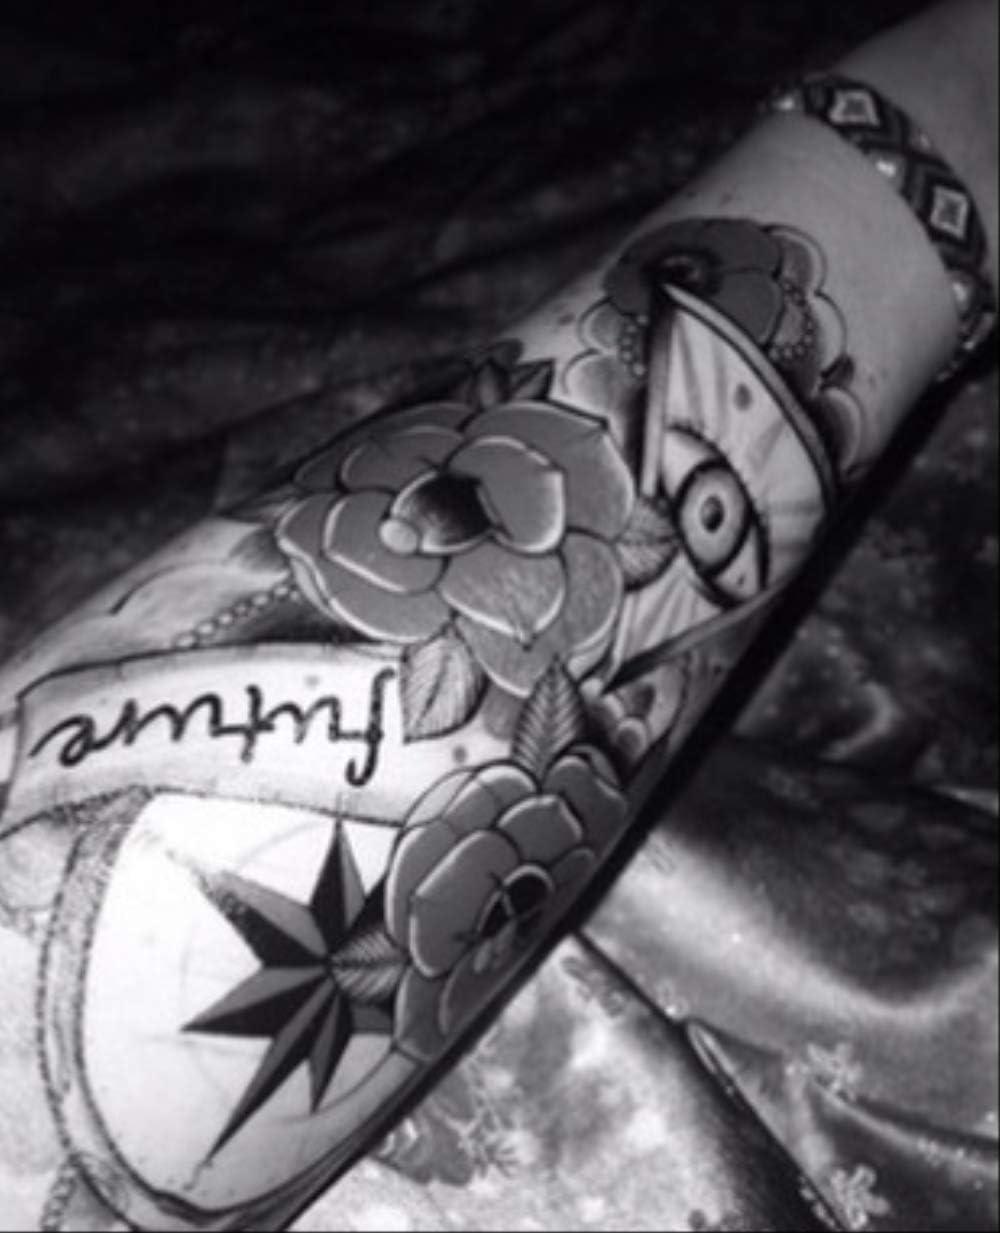 Tatuaje pegatinas impermeables hombres y mujeres Harajuku ...